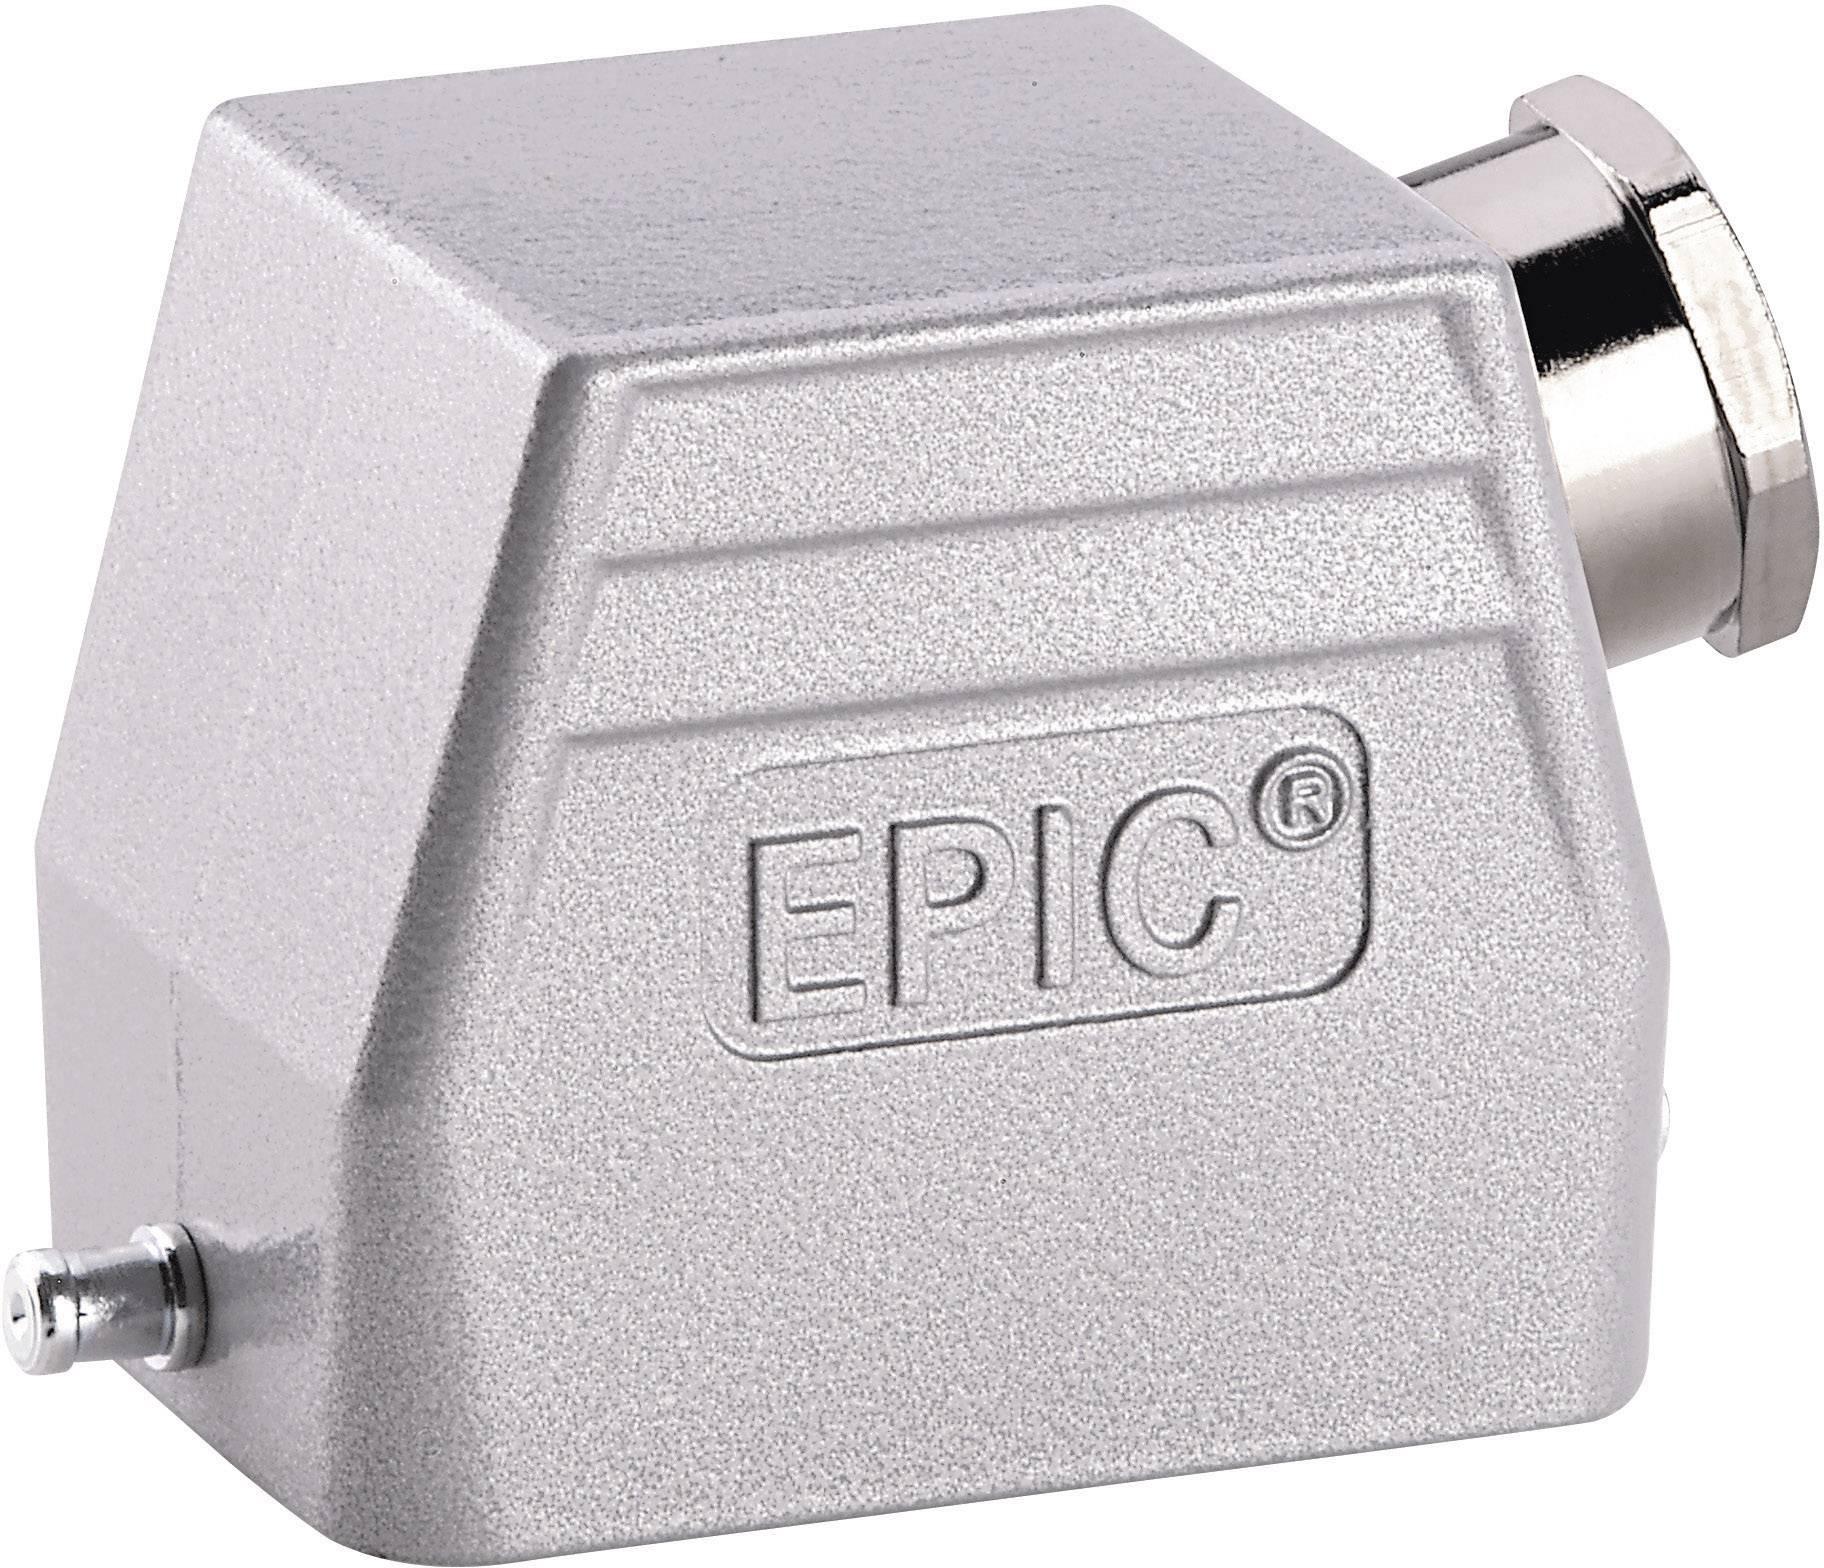 LappKabel EPIC® H-B 6 TS M25 ZW (19022000), IP65, šedá